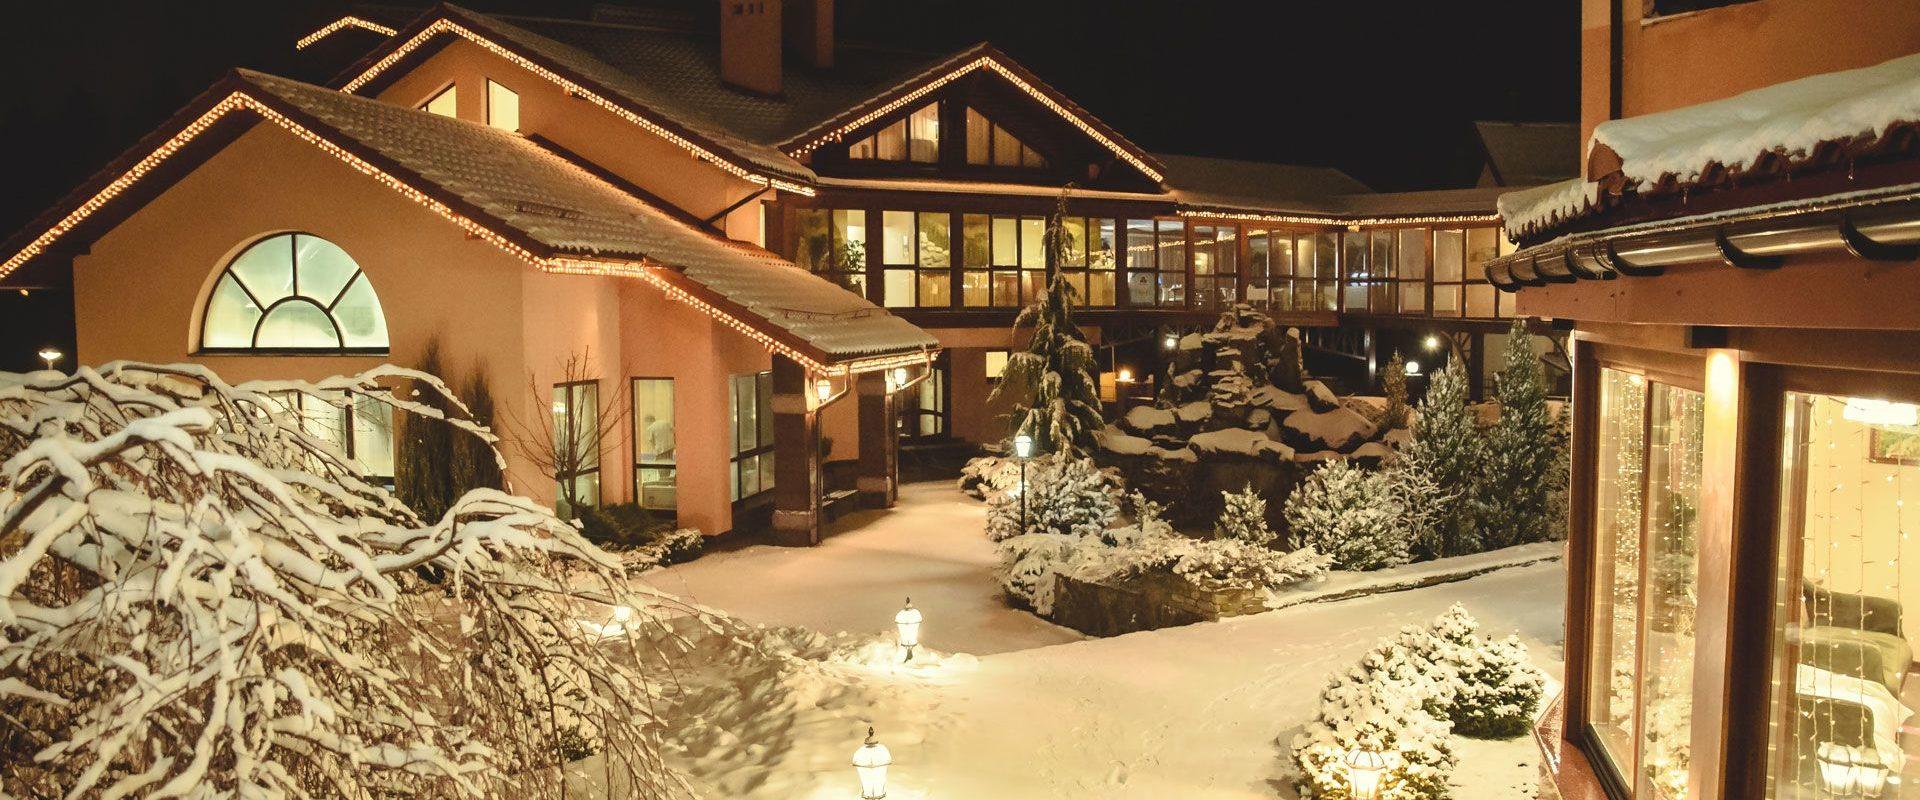 Homespa-hotel Respect